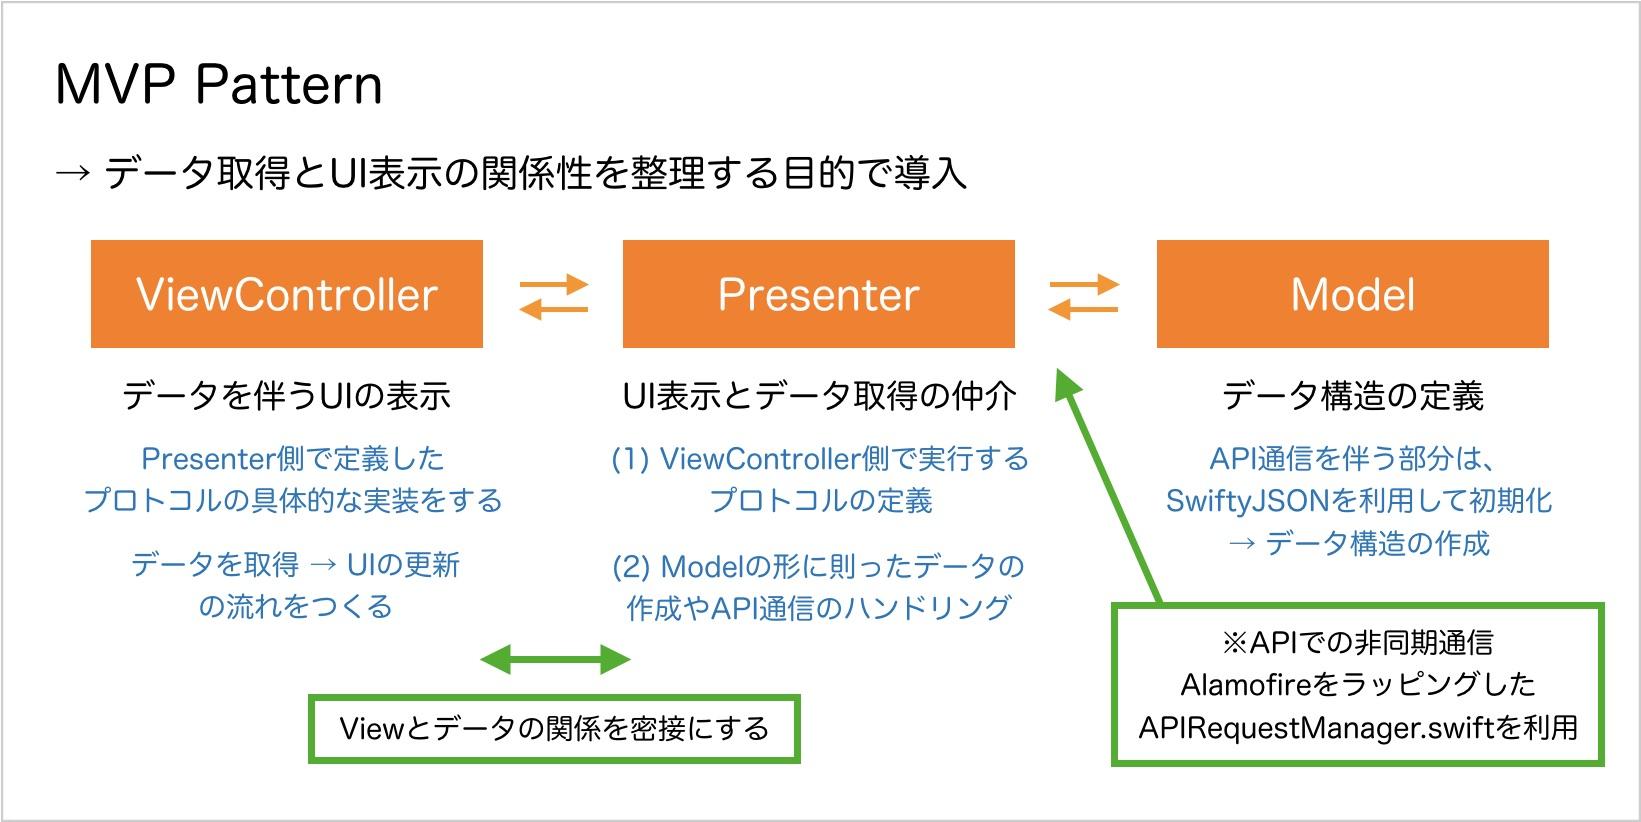 mvp-pattern.jpg